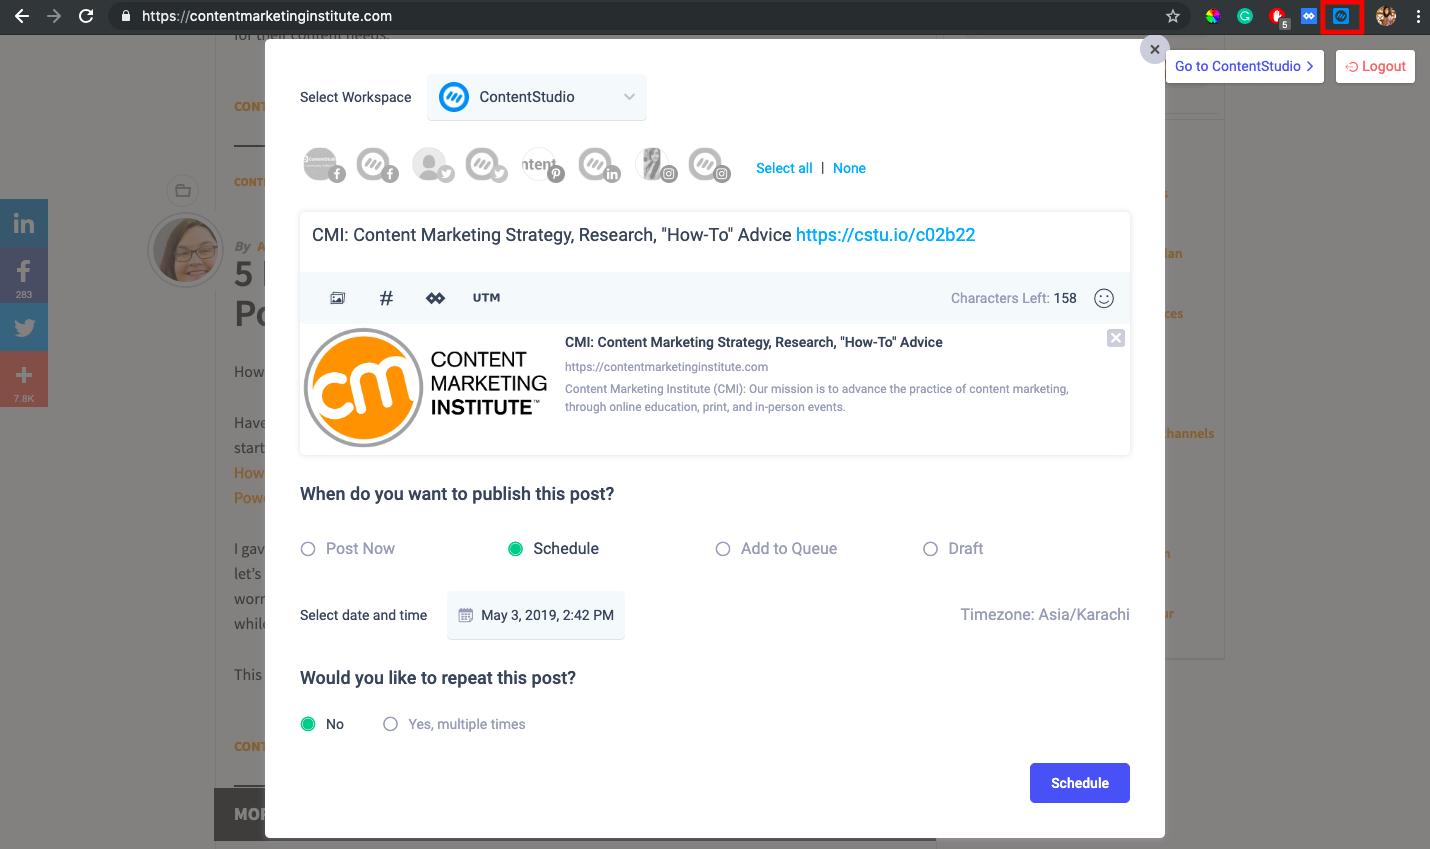 Chrome Extension - ContentStudio